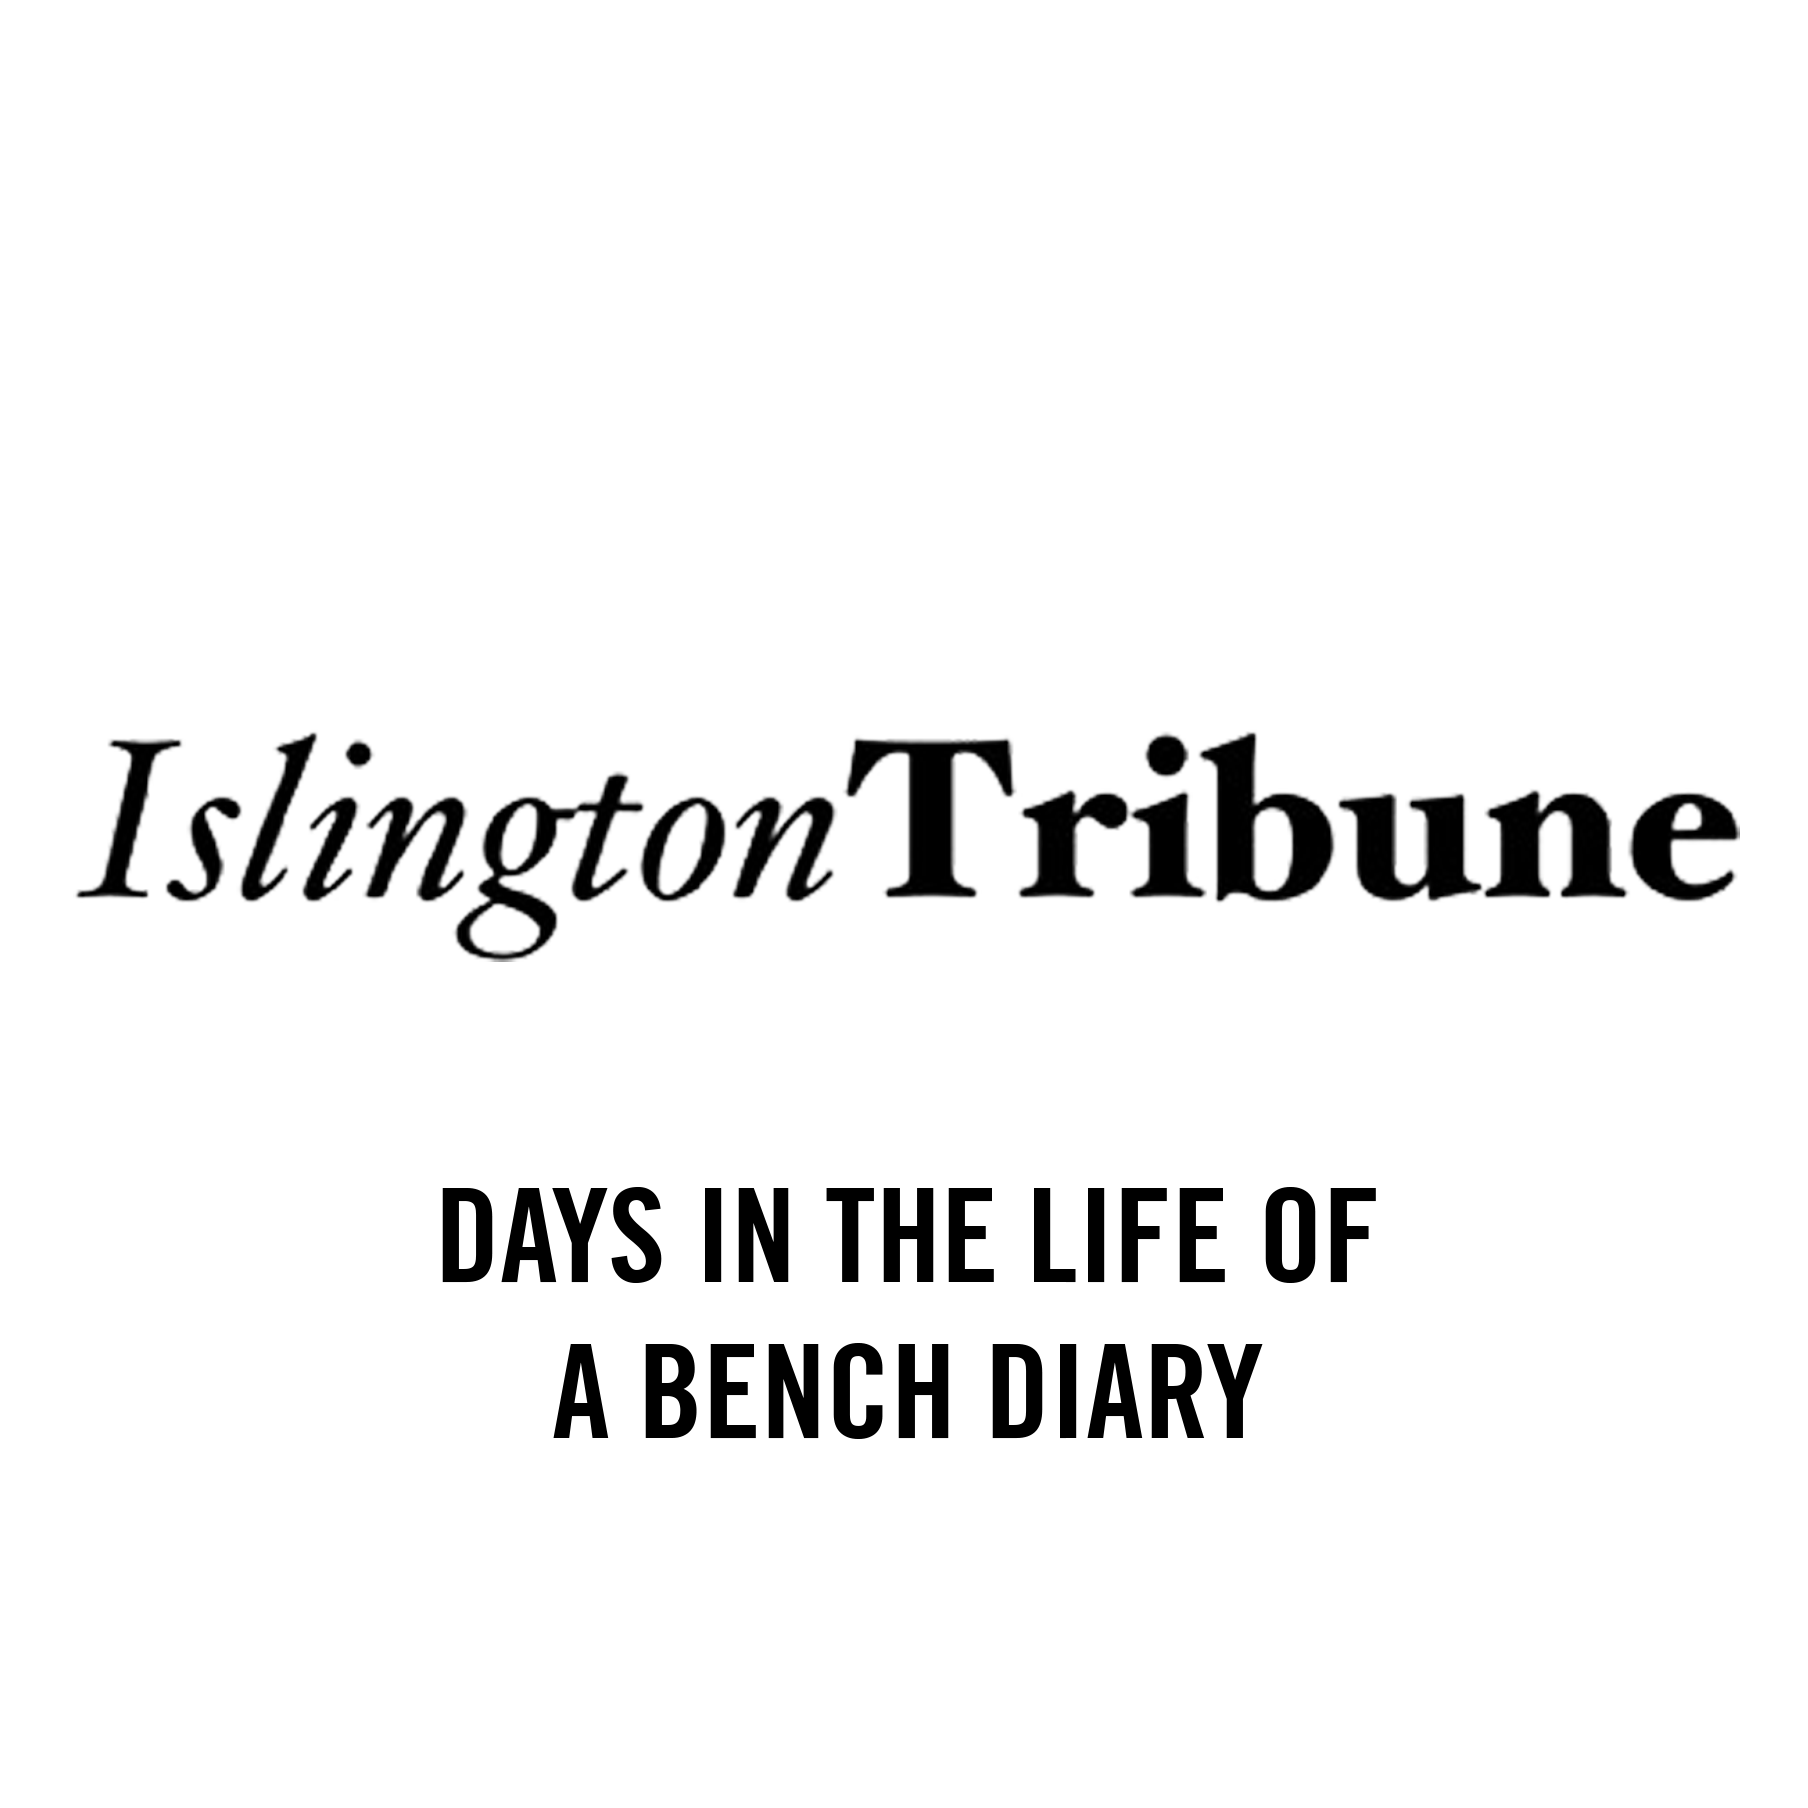 islington tribune press.png